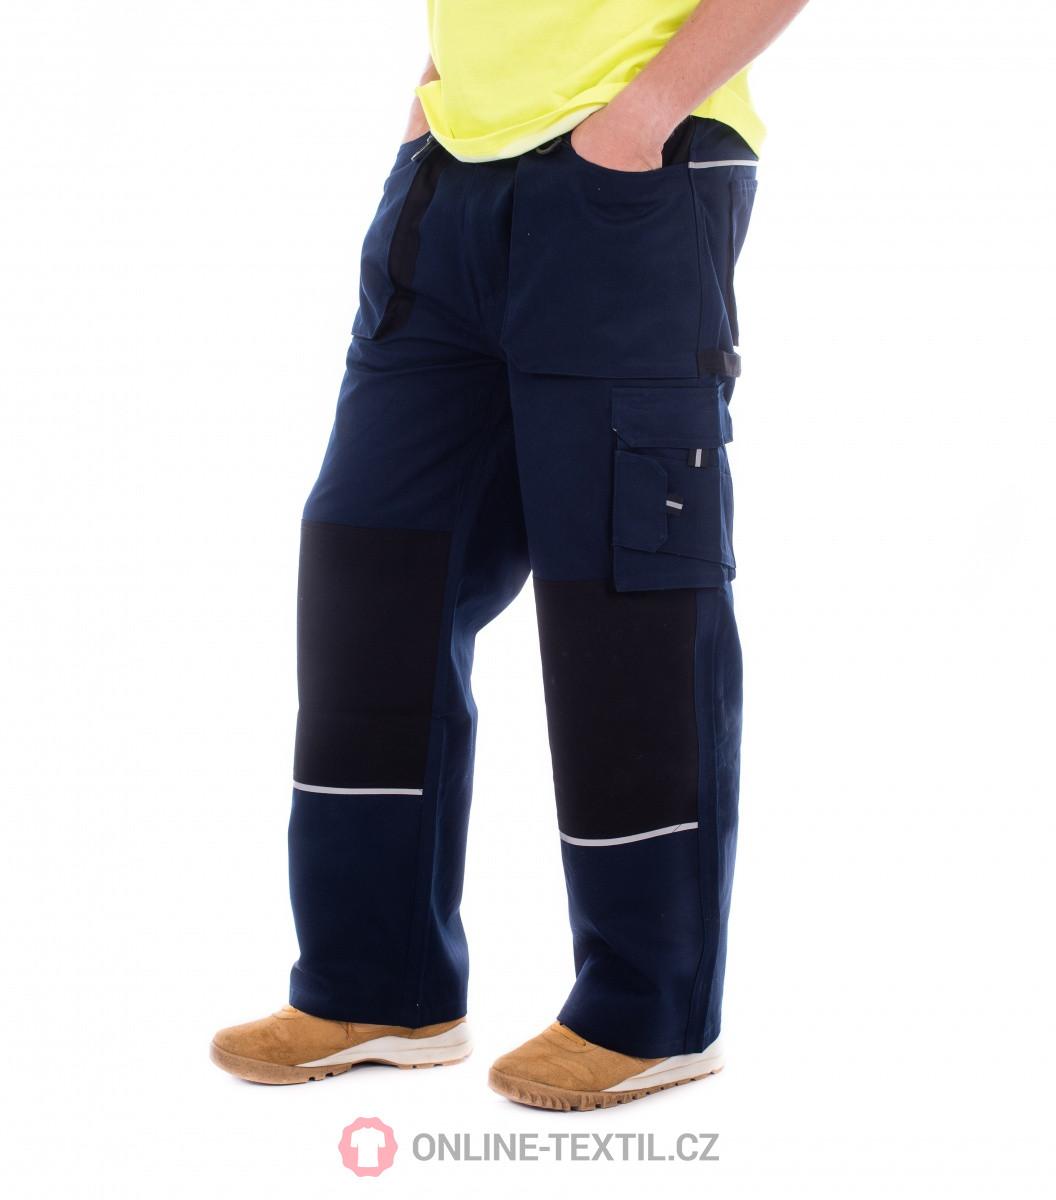 ef752d3c5c5f ADLER CZECH Woody pracovné nohavice pánske Rimeck W01 - tmavomodrá z ...